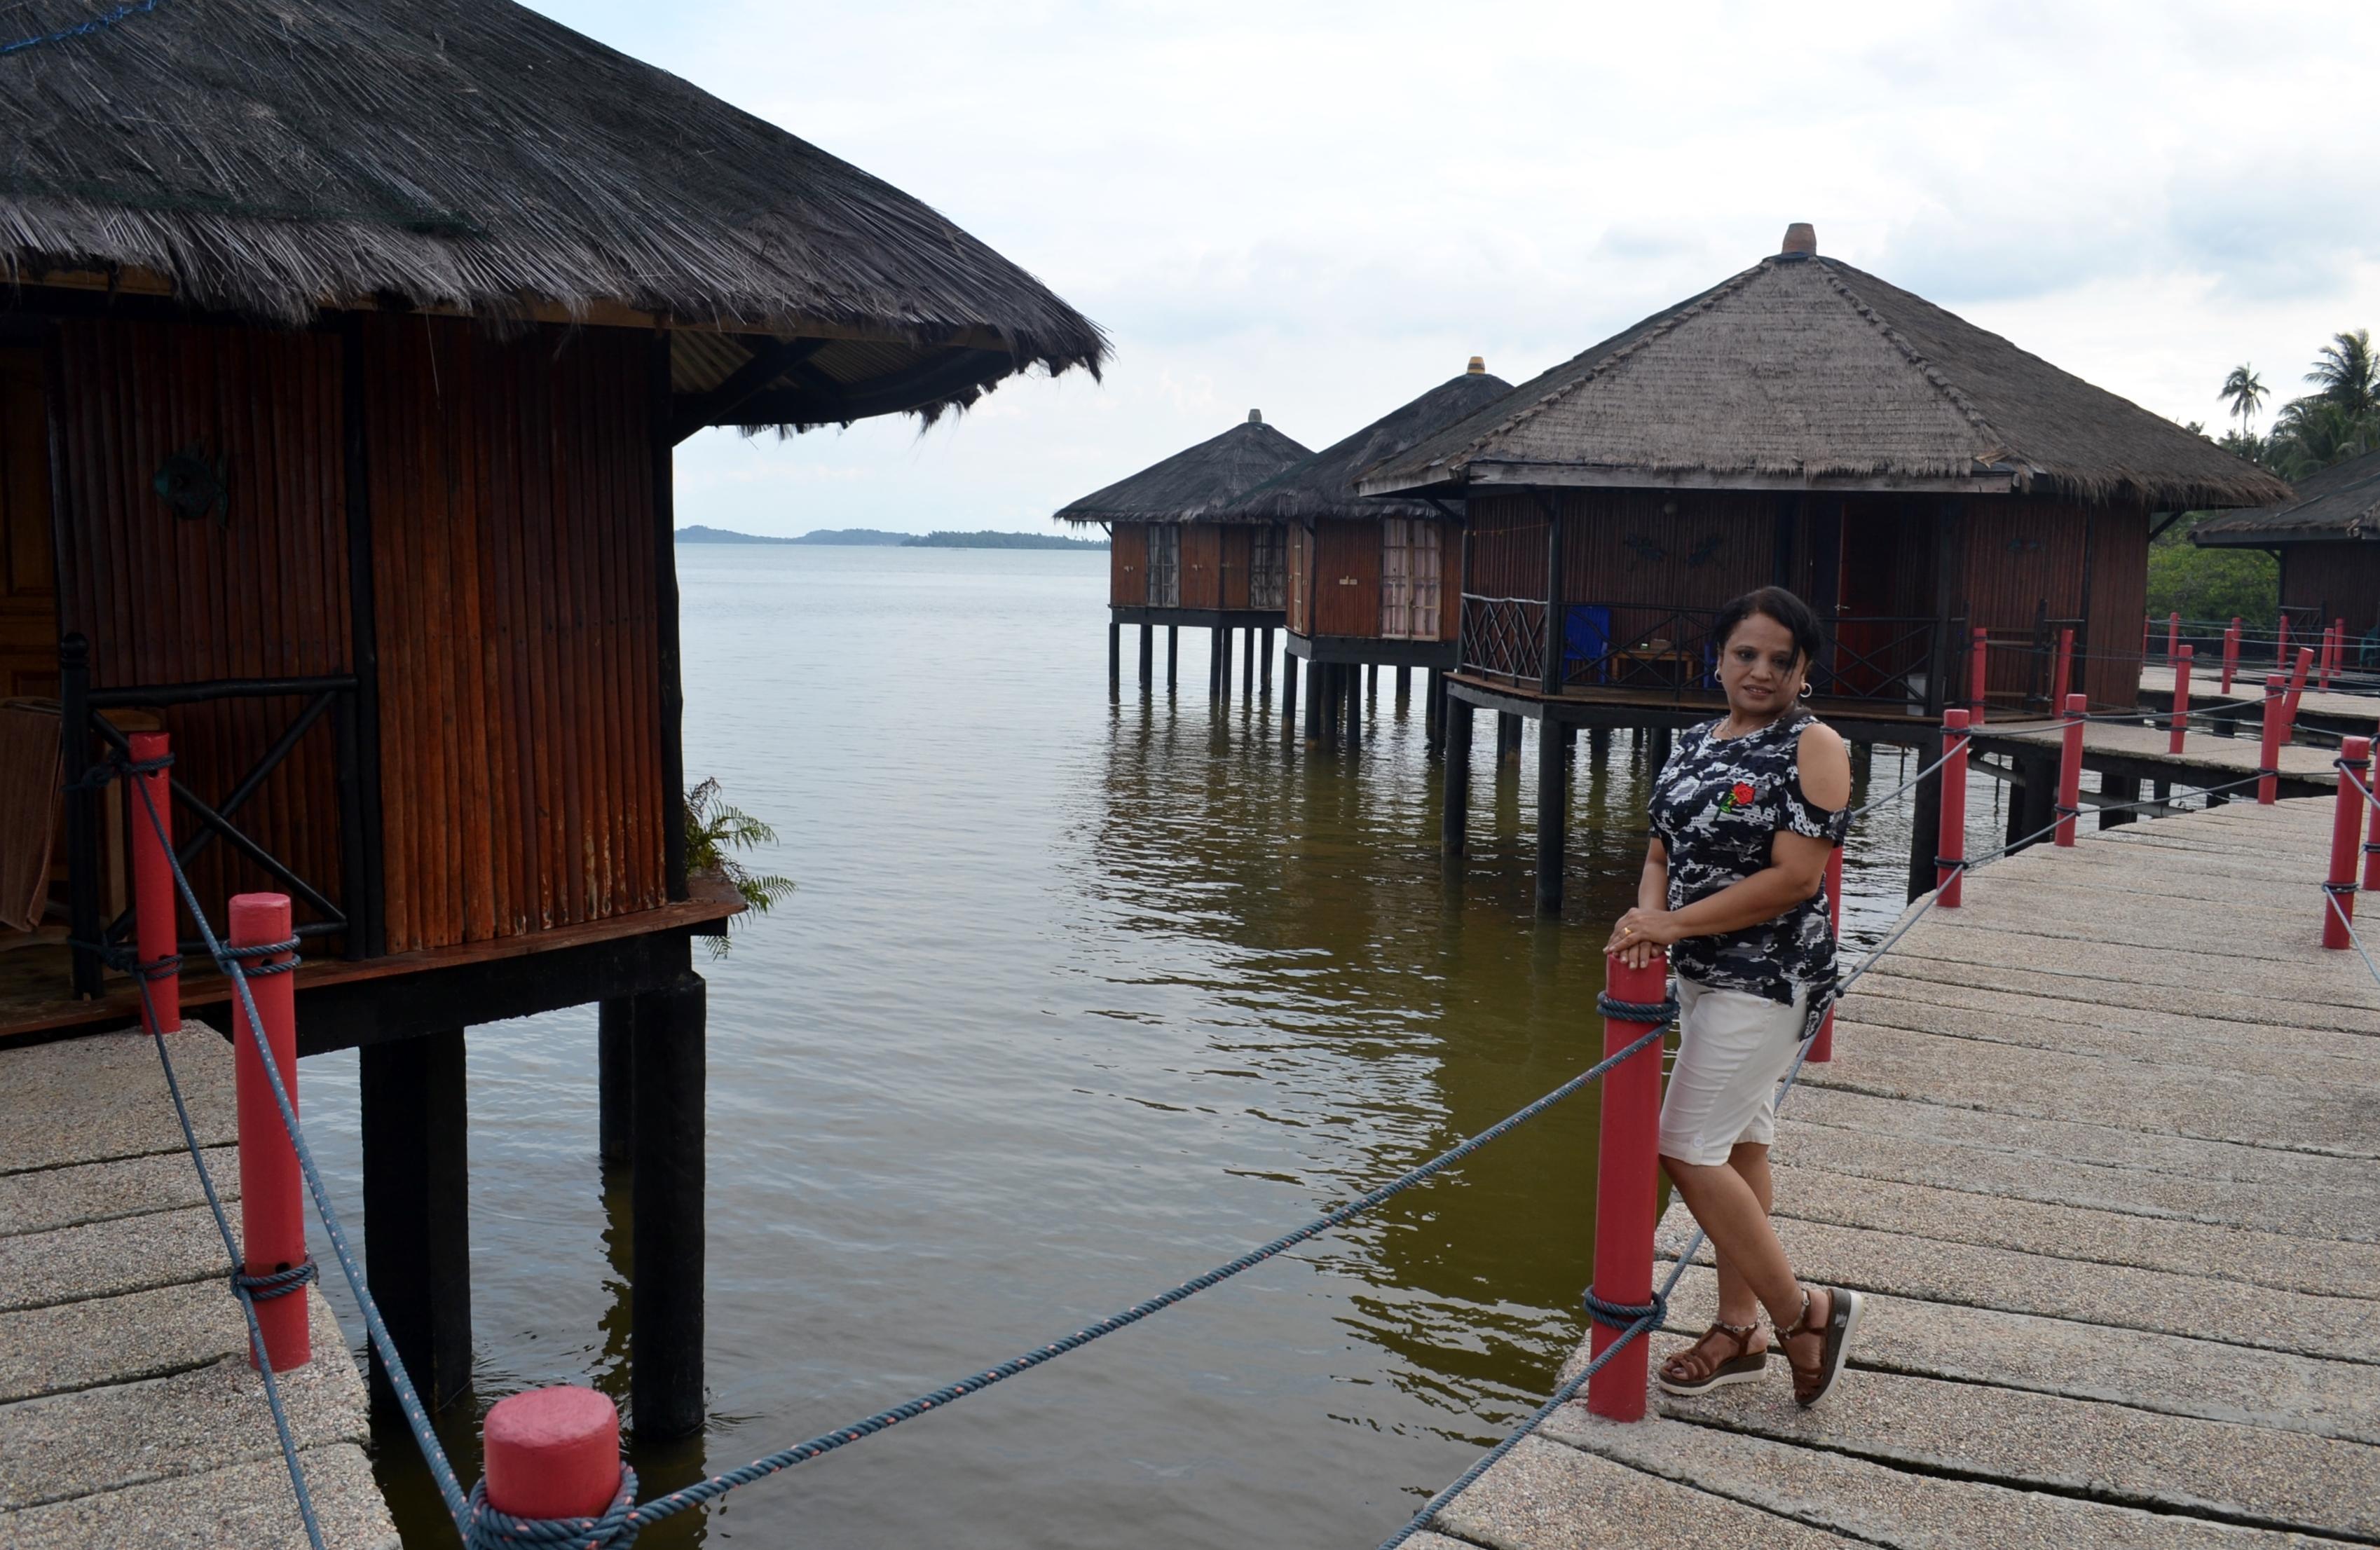 thai hieronta rauma finland escorts